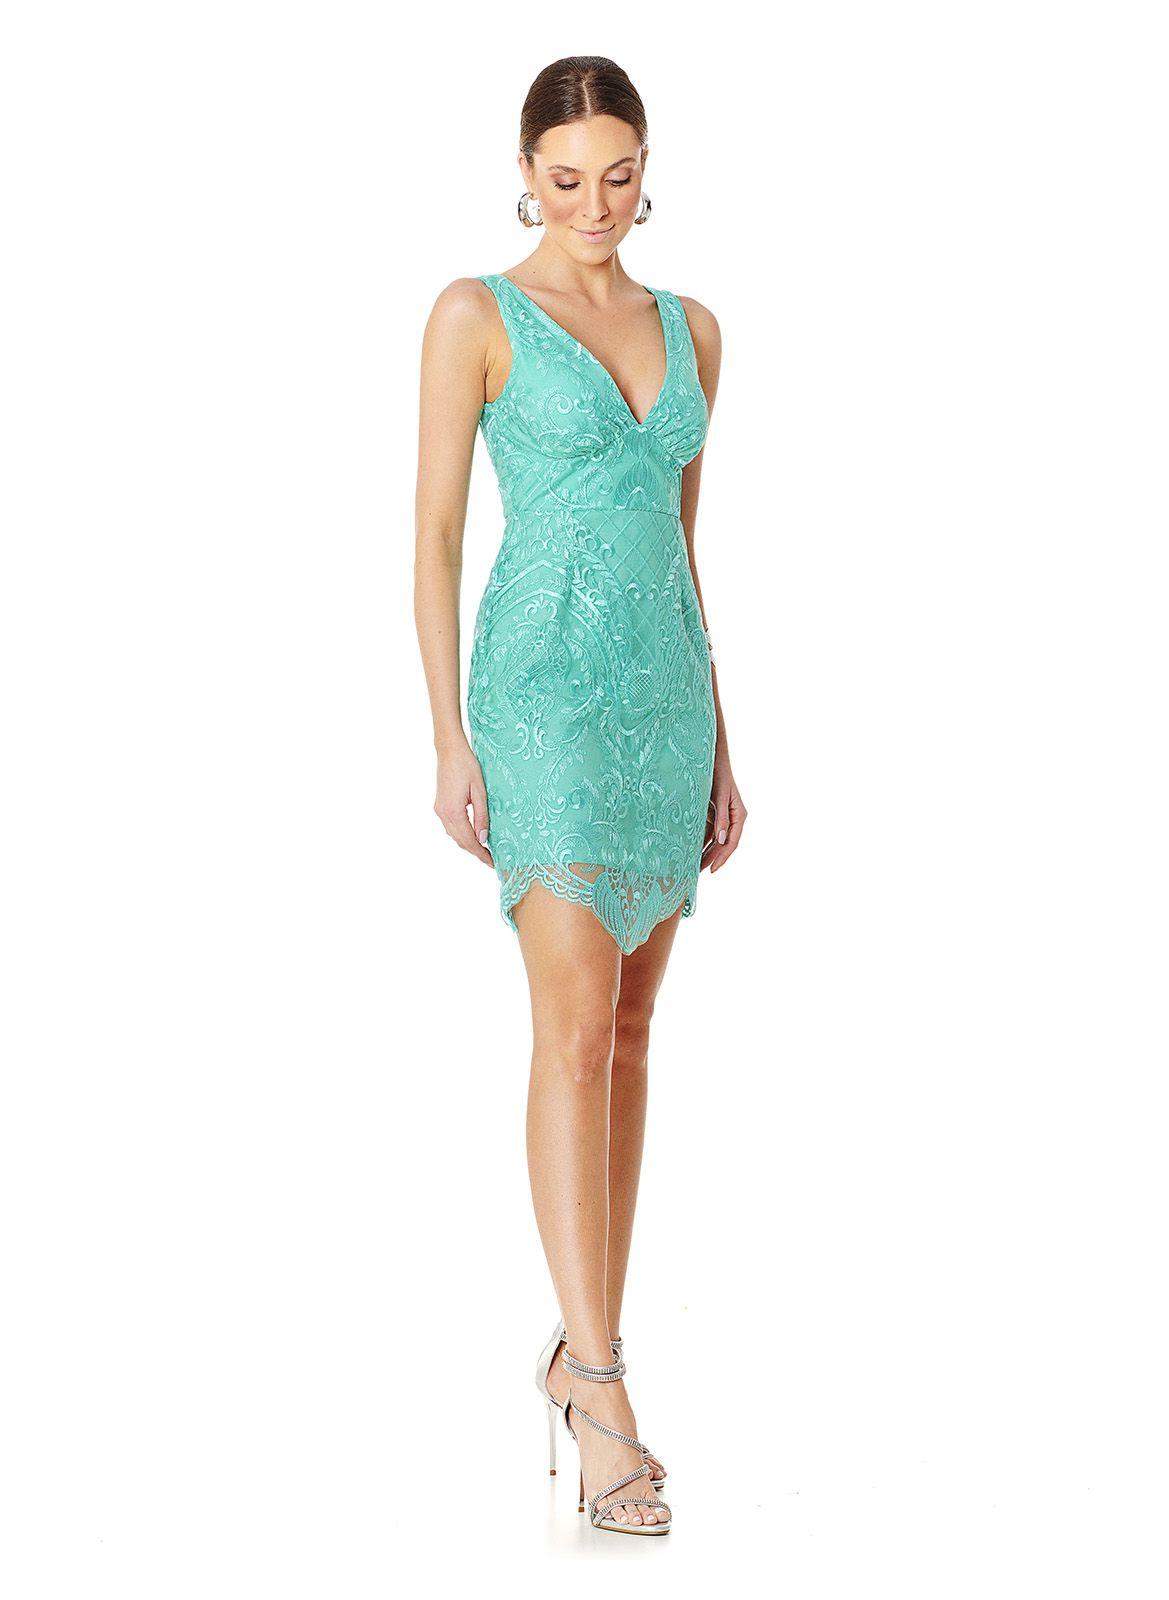 Vestido Curto Tule Azul Tiffany Lala Dubi